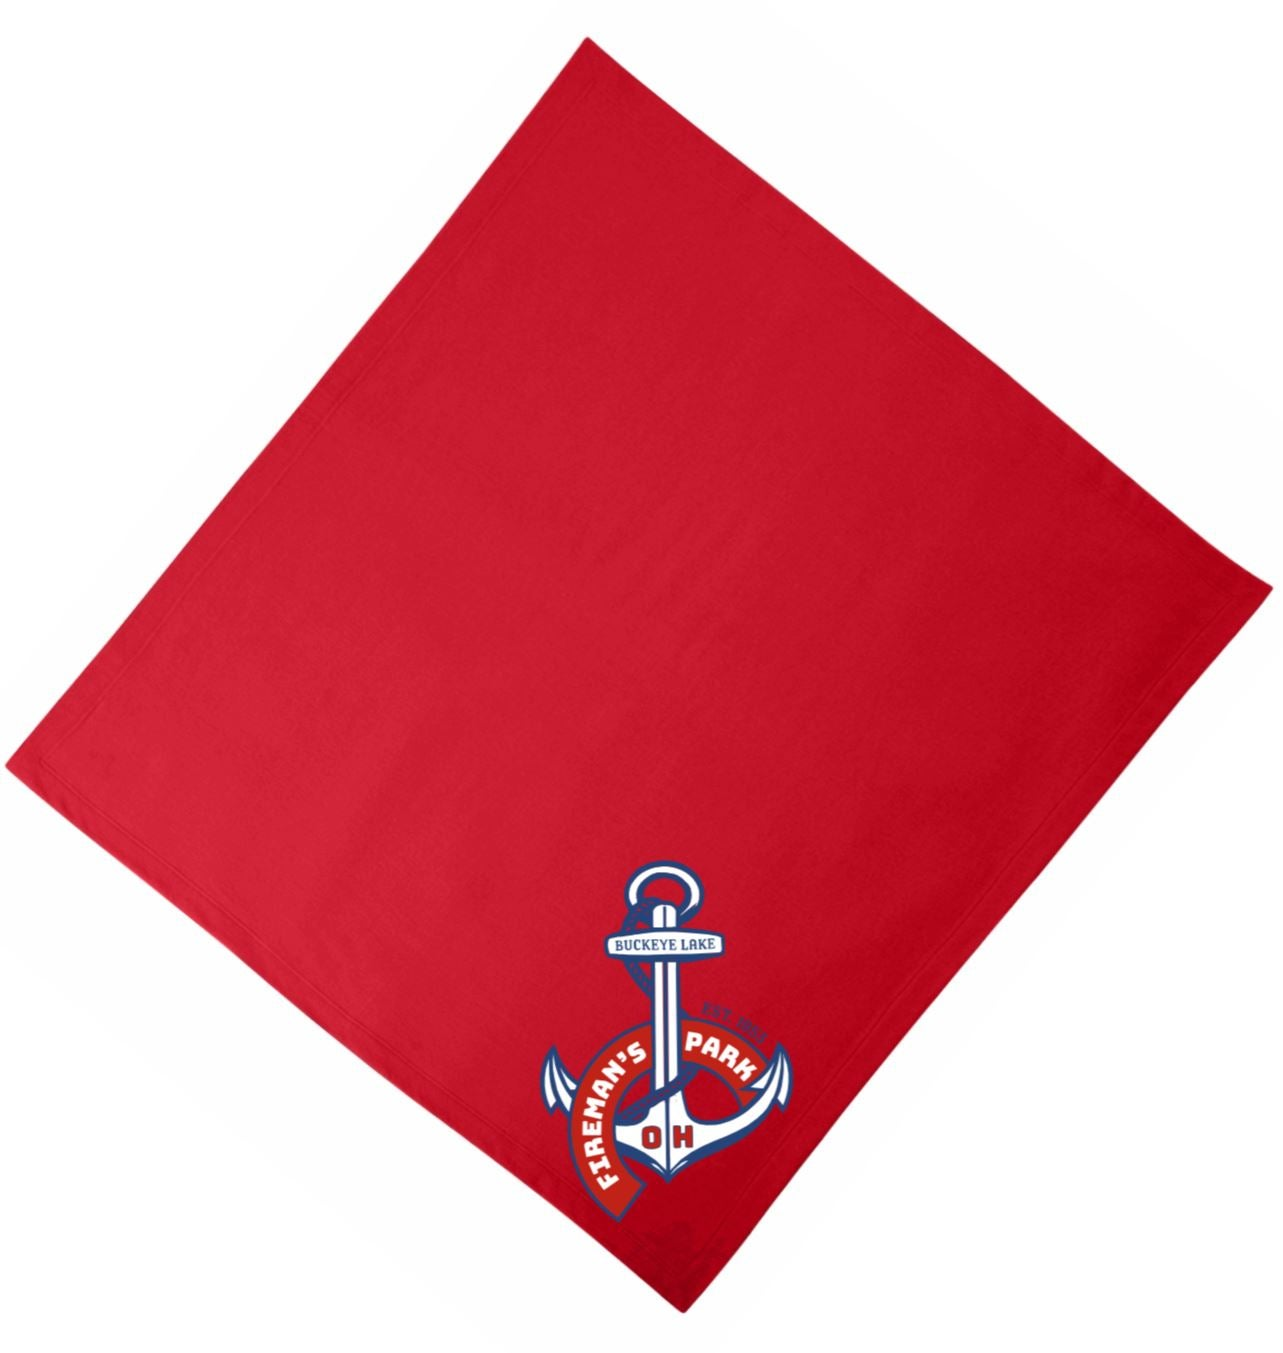 Image of Fleece Blanket Anchor Design